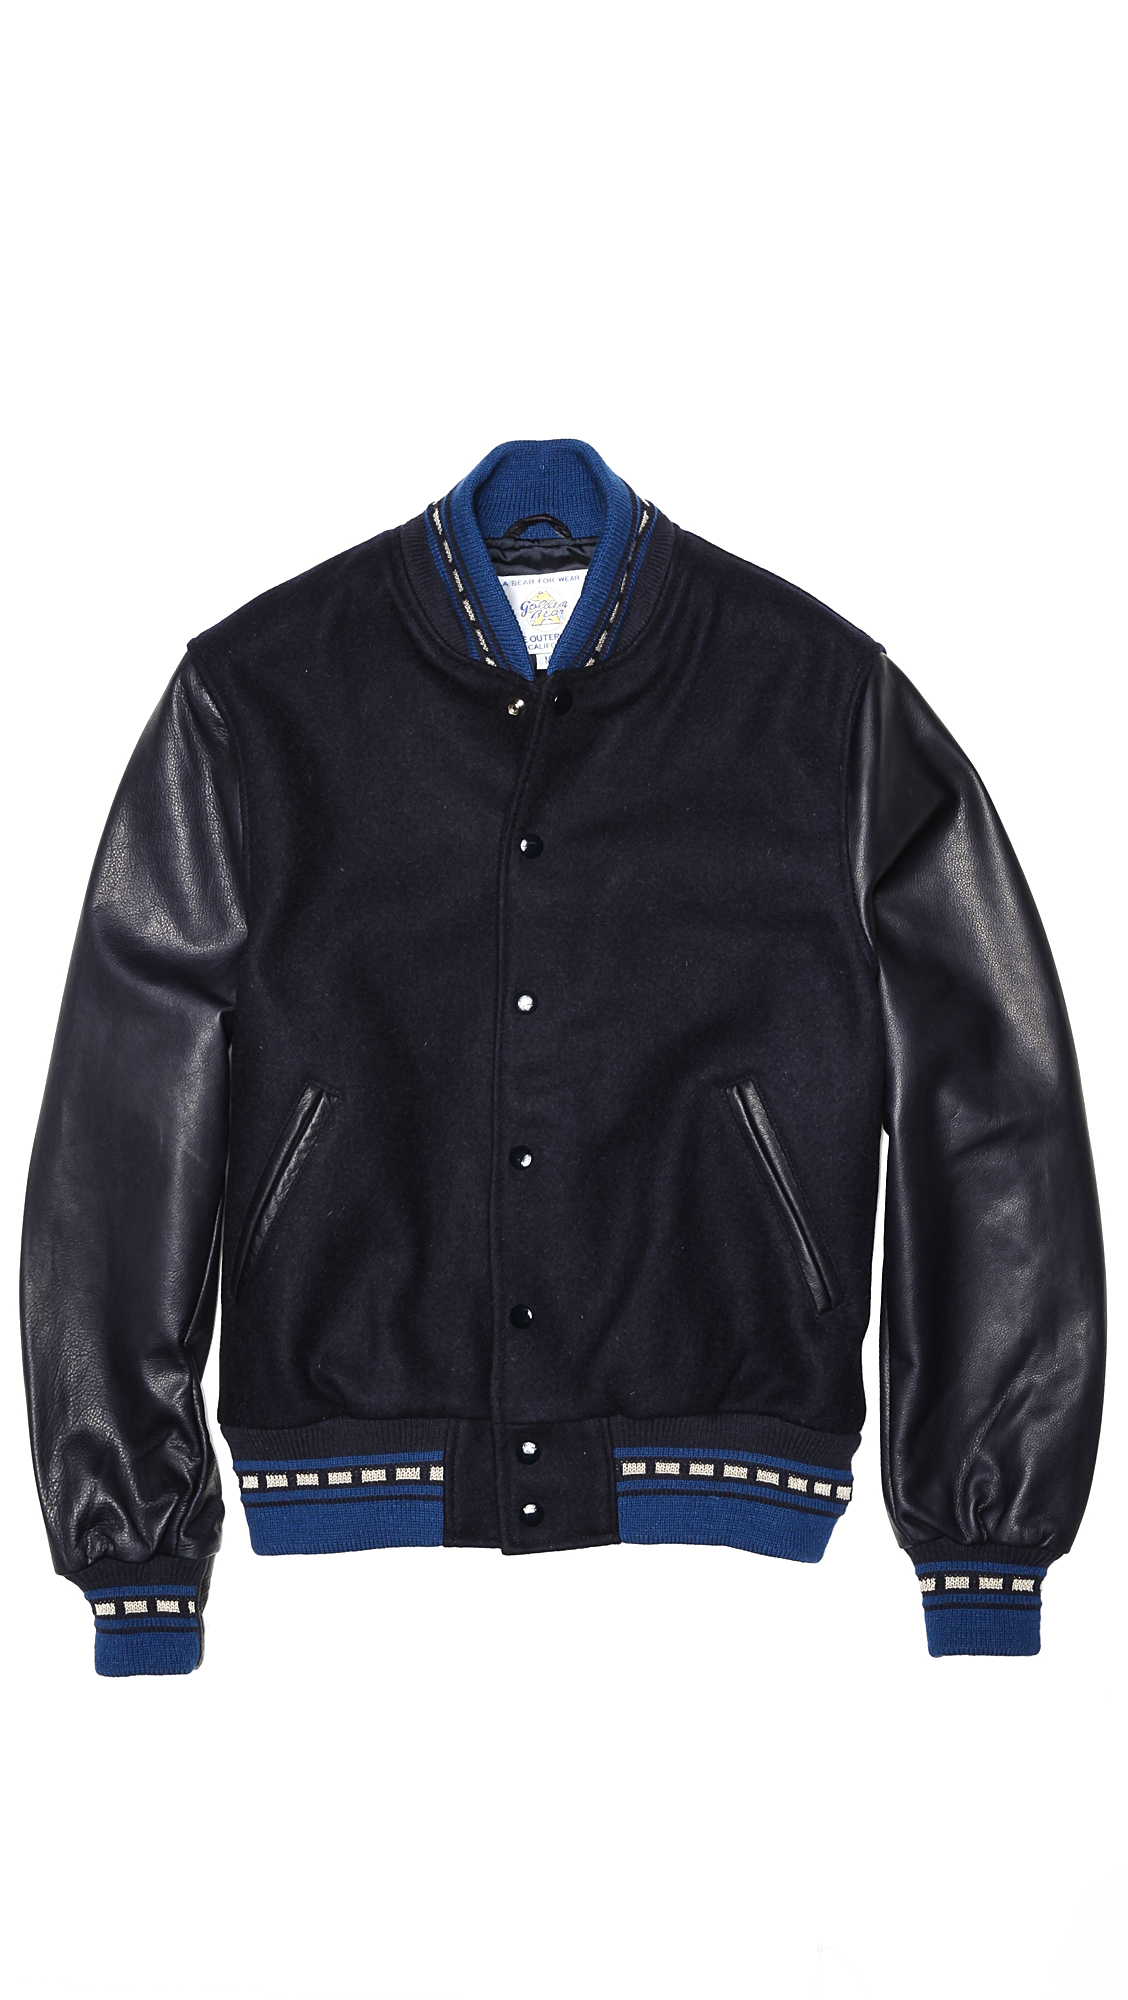 Bear Golden Leather Coats